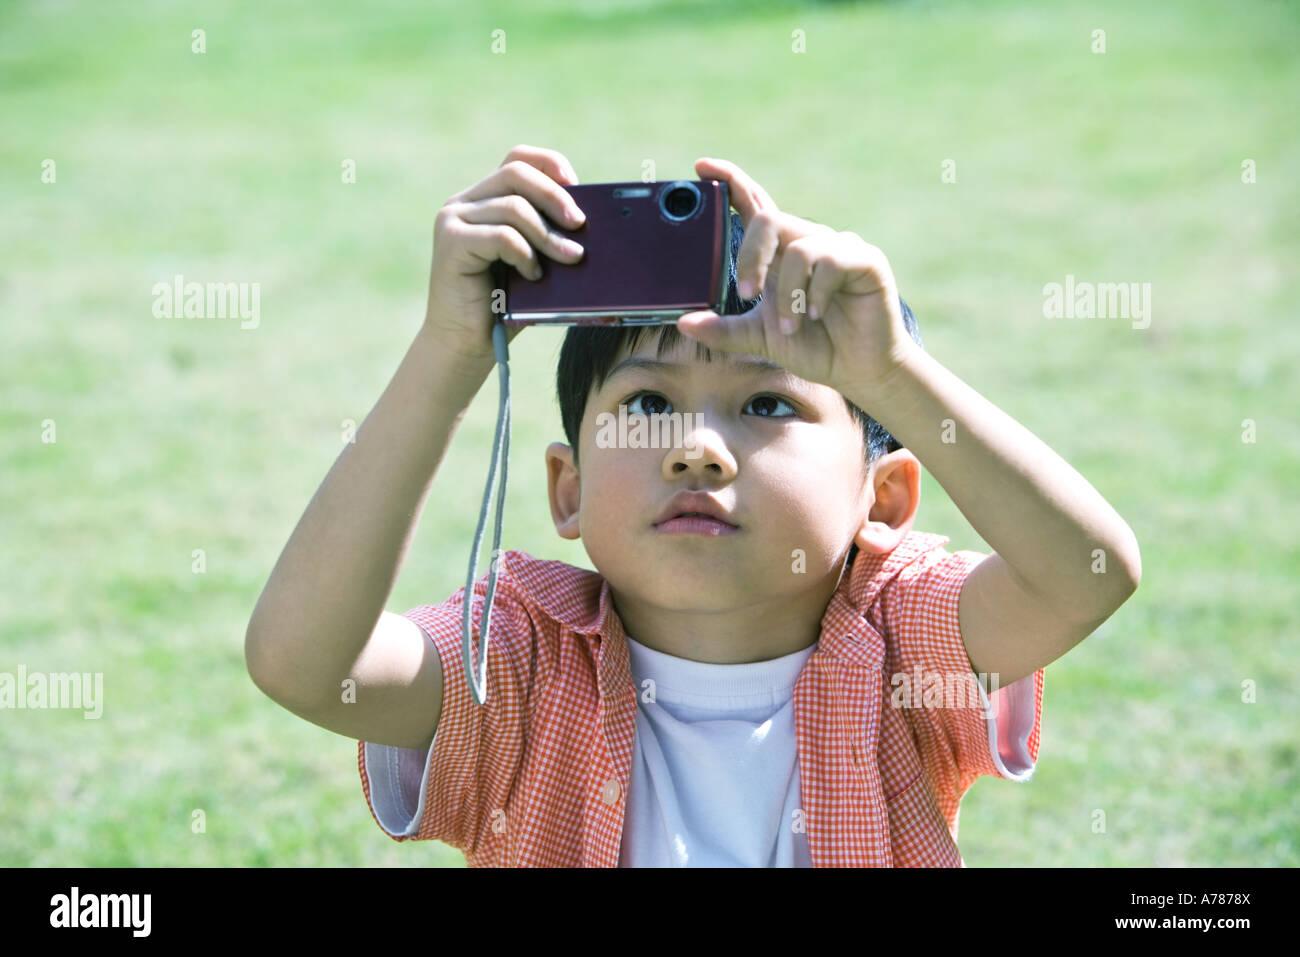 Boy using digital camera - Stock Image